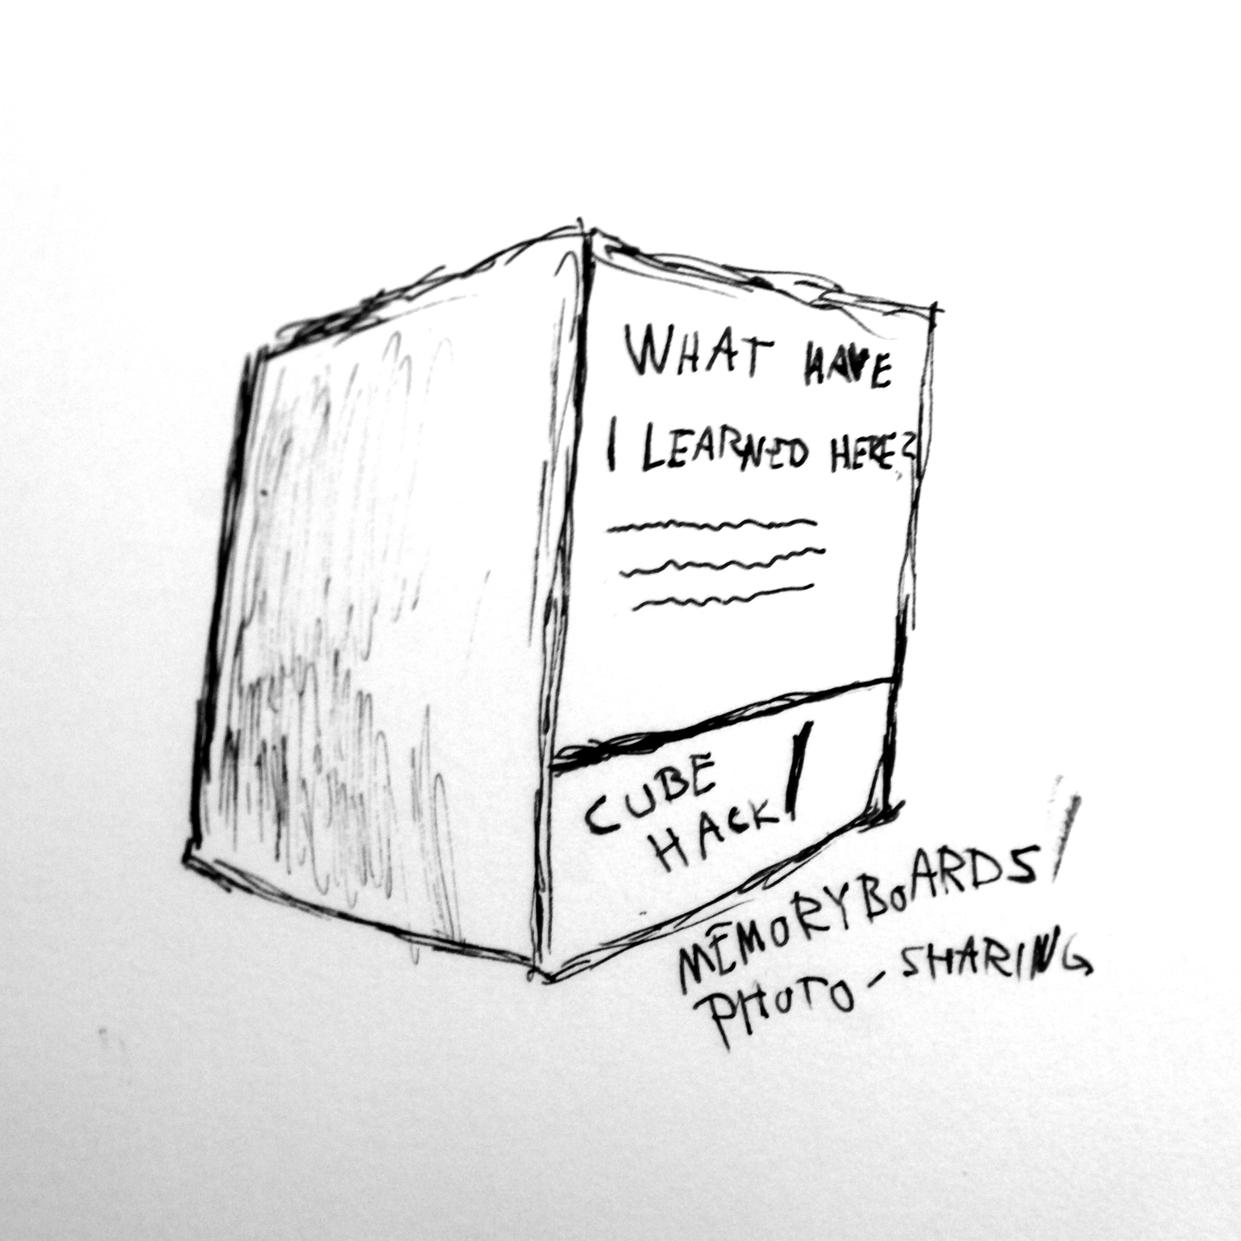 Cube Hack